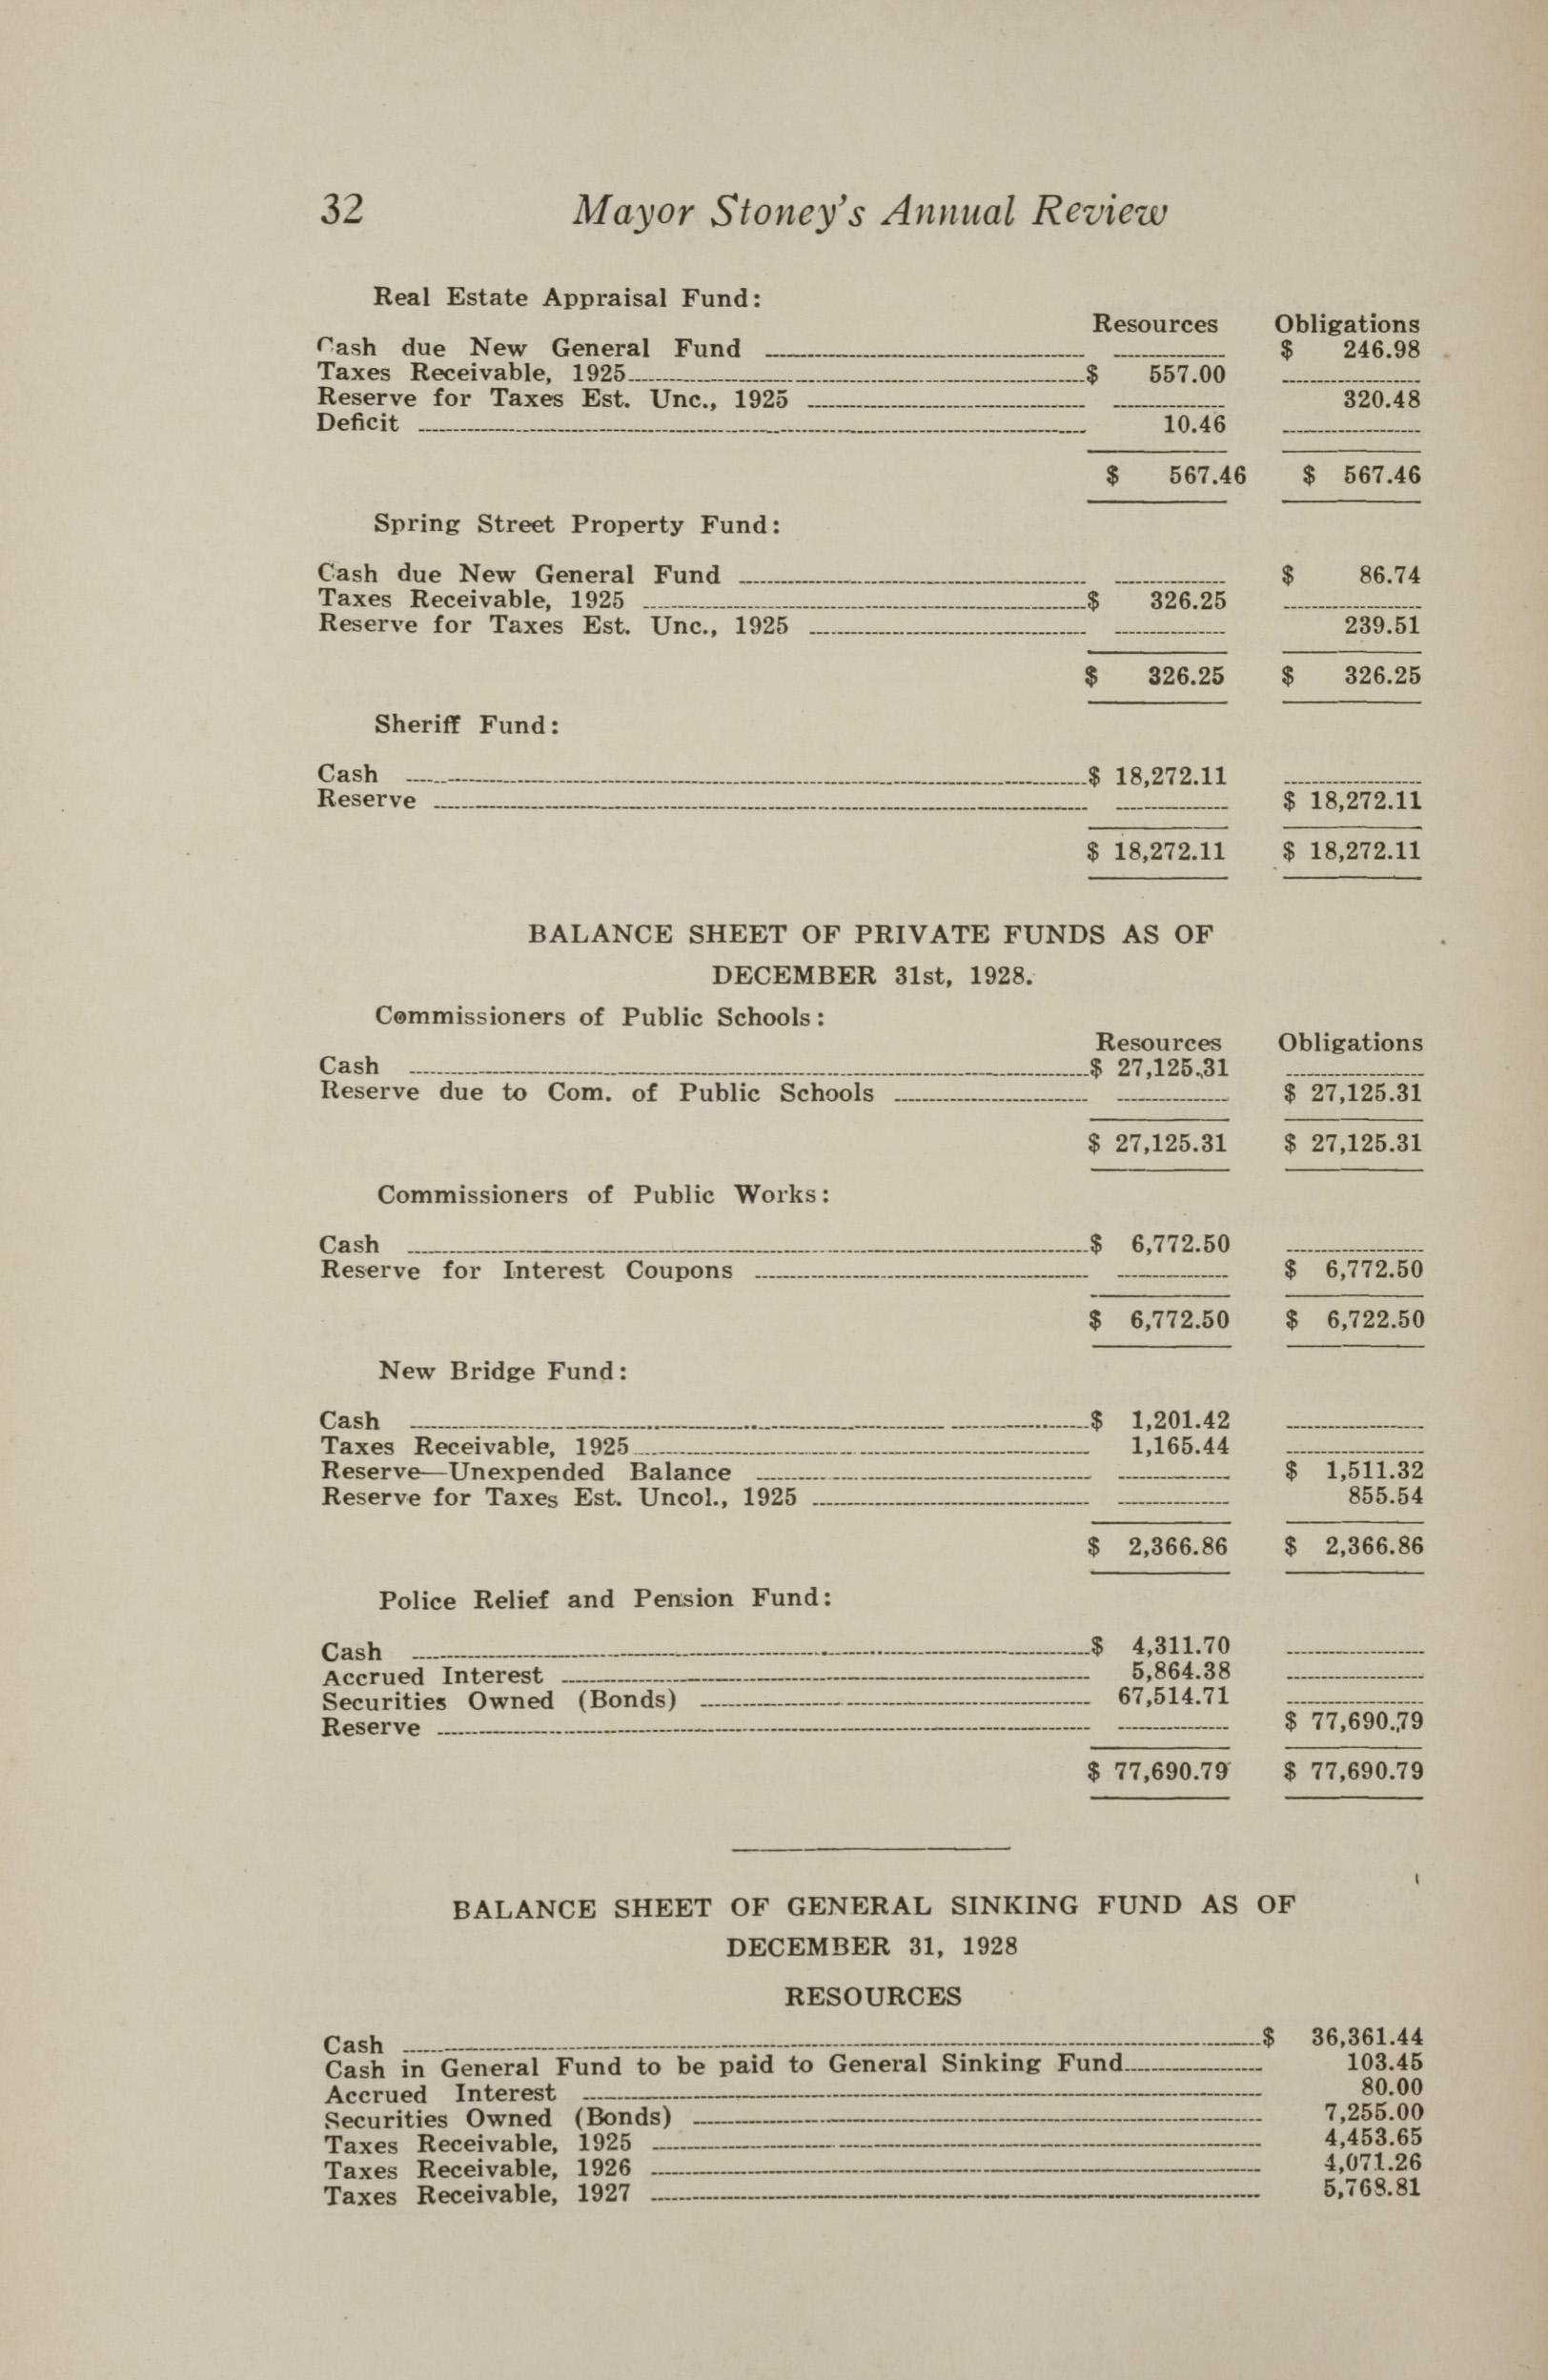 Charleston Yearbook, 1928, page 32